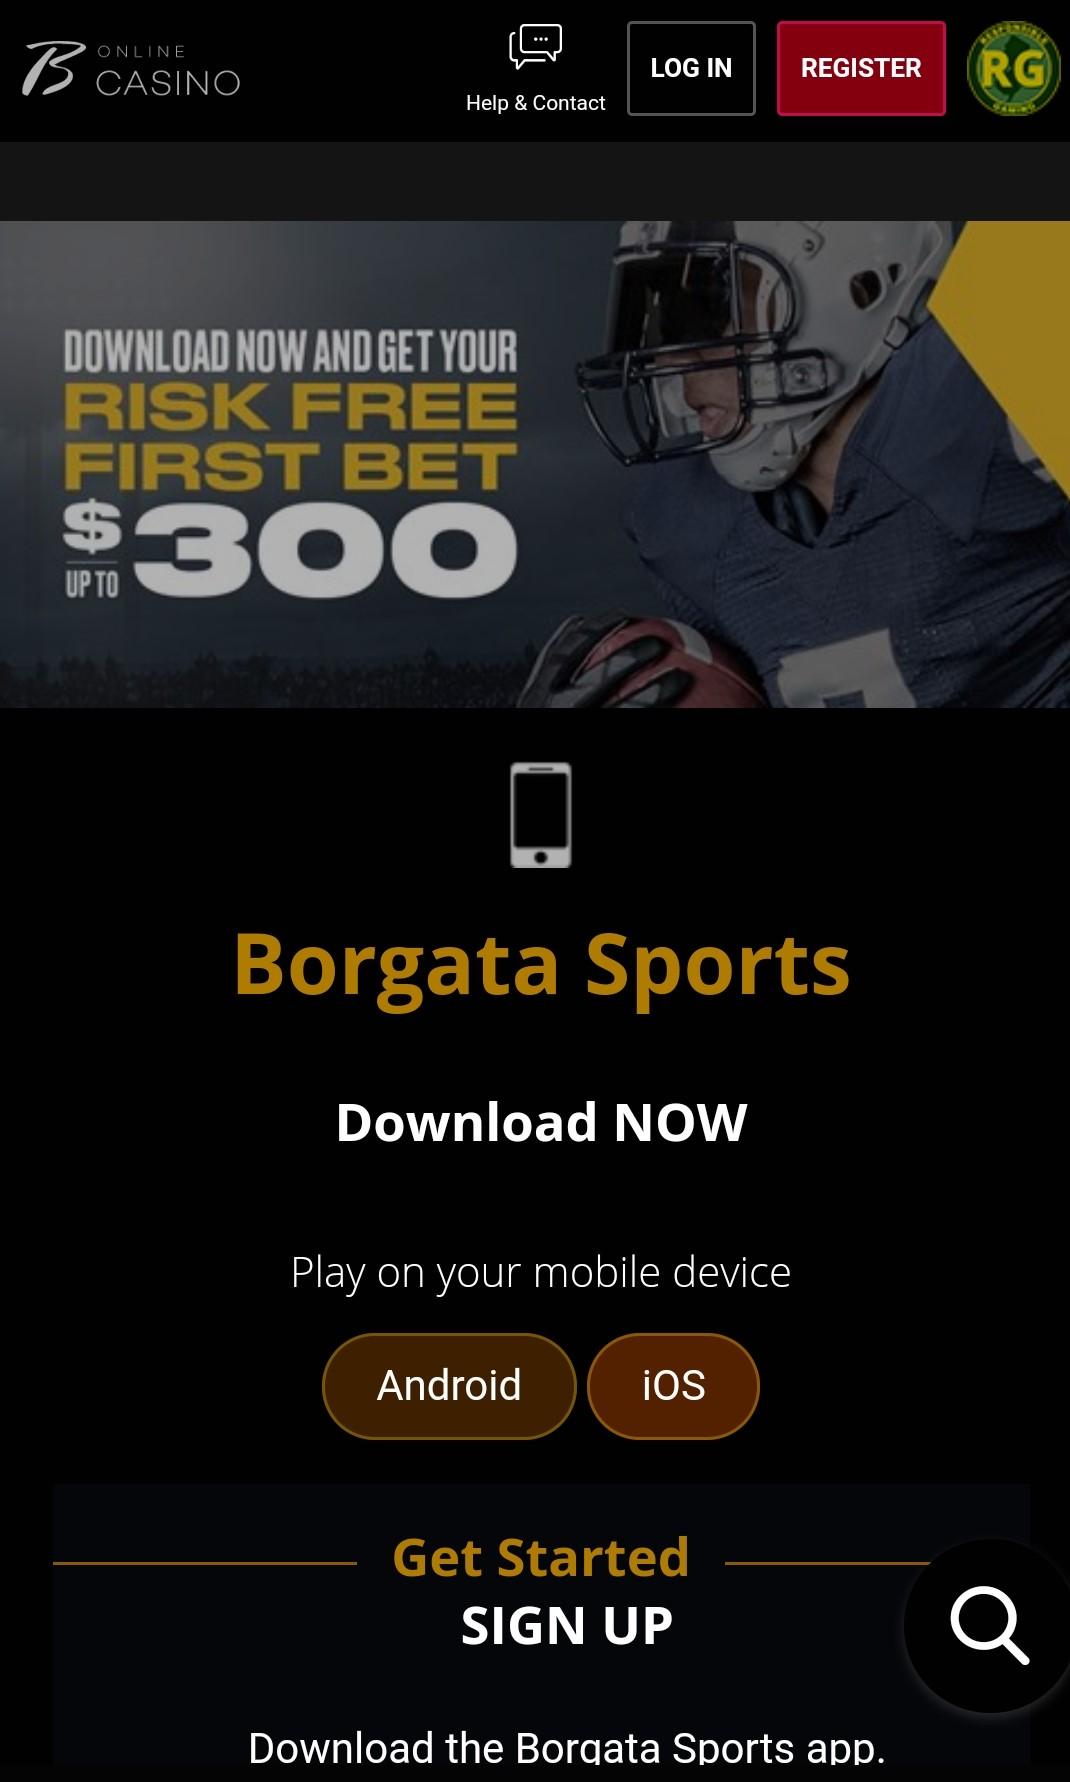 Borgata sports betting app 888 free 88 betting